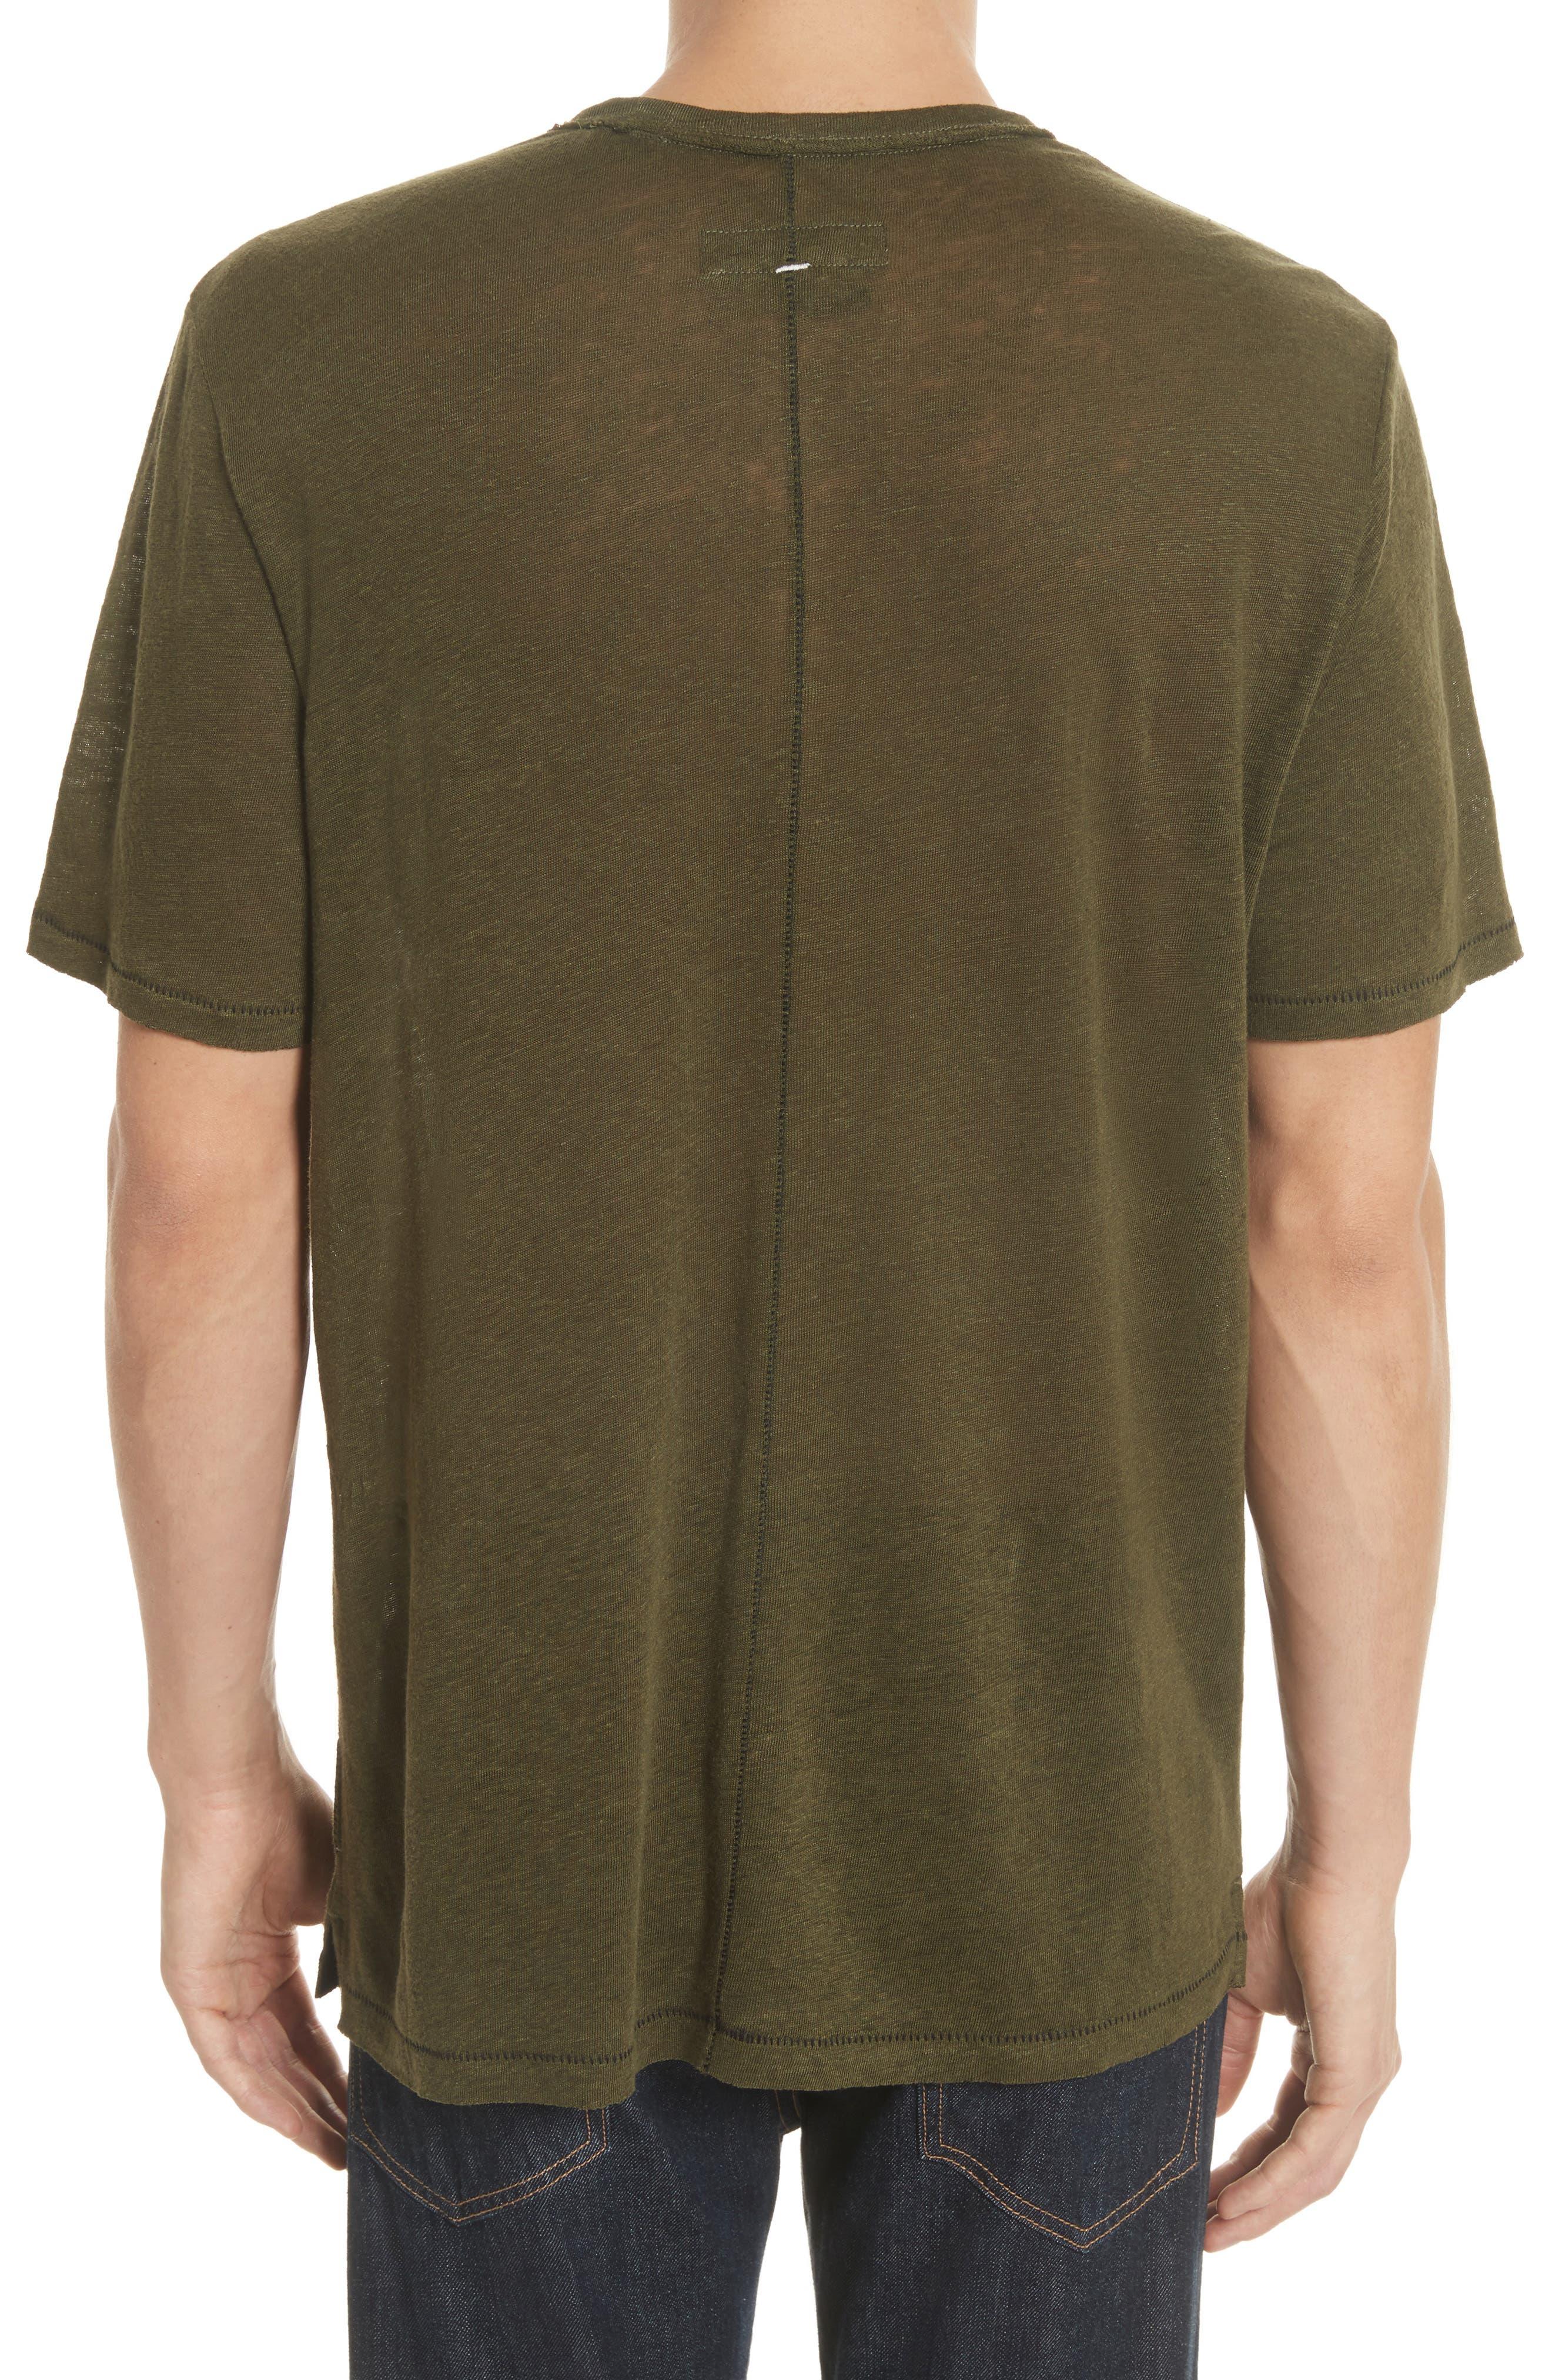 Owen T-Shirt,                             Alternate thumbnail 2, color,                             Army